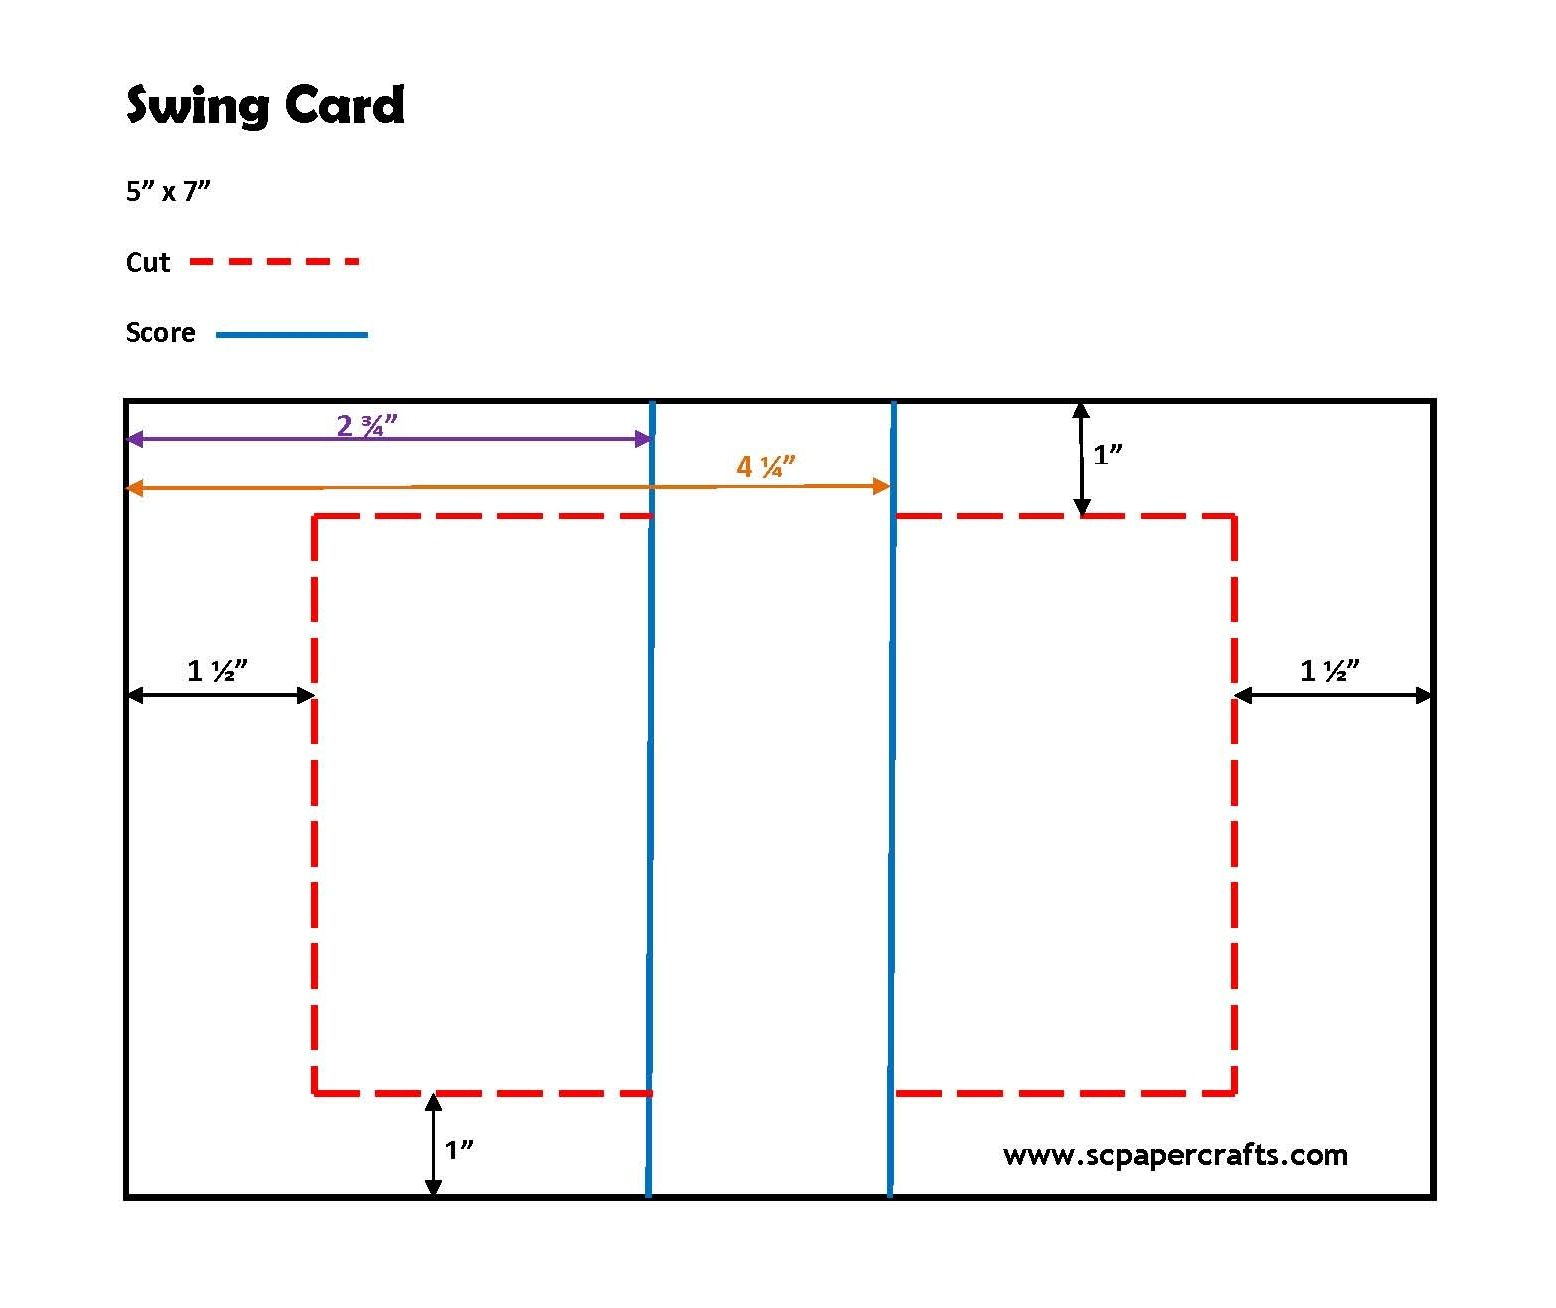 How to cut/score a swing card | Tarjetas plegables | Pinterest ...